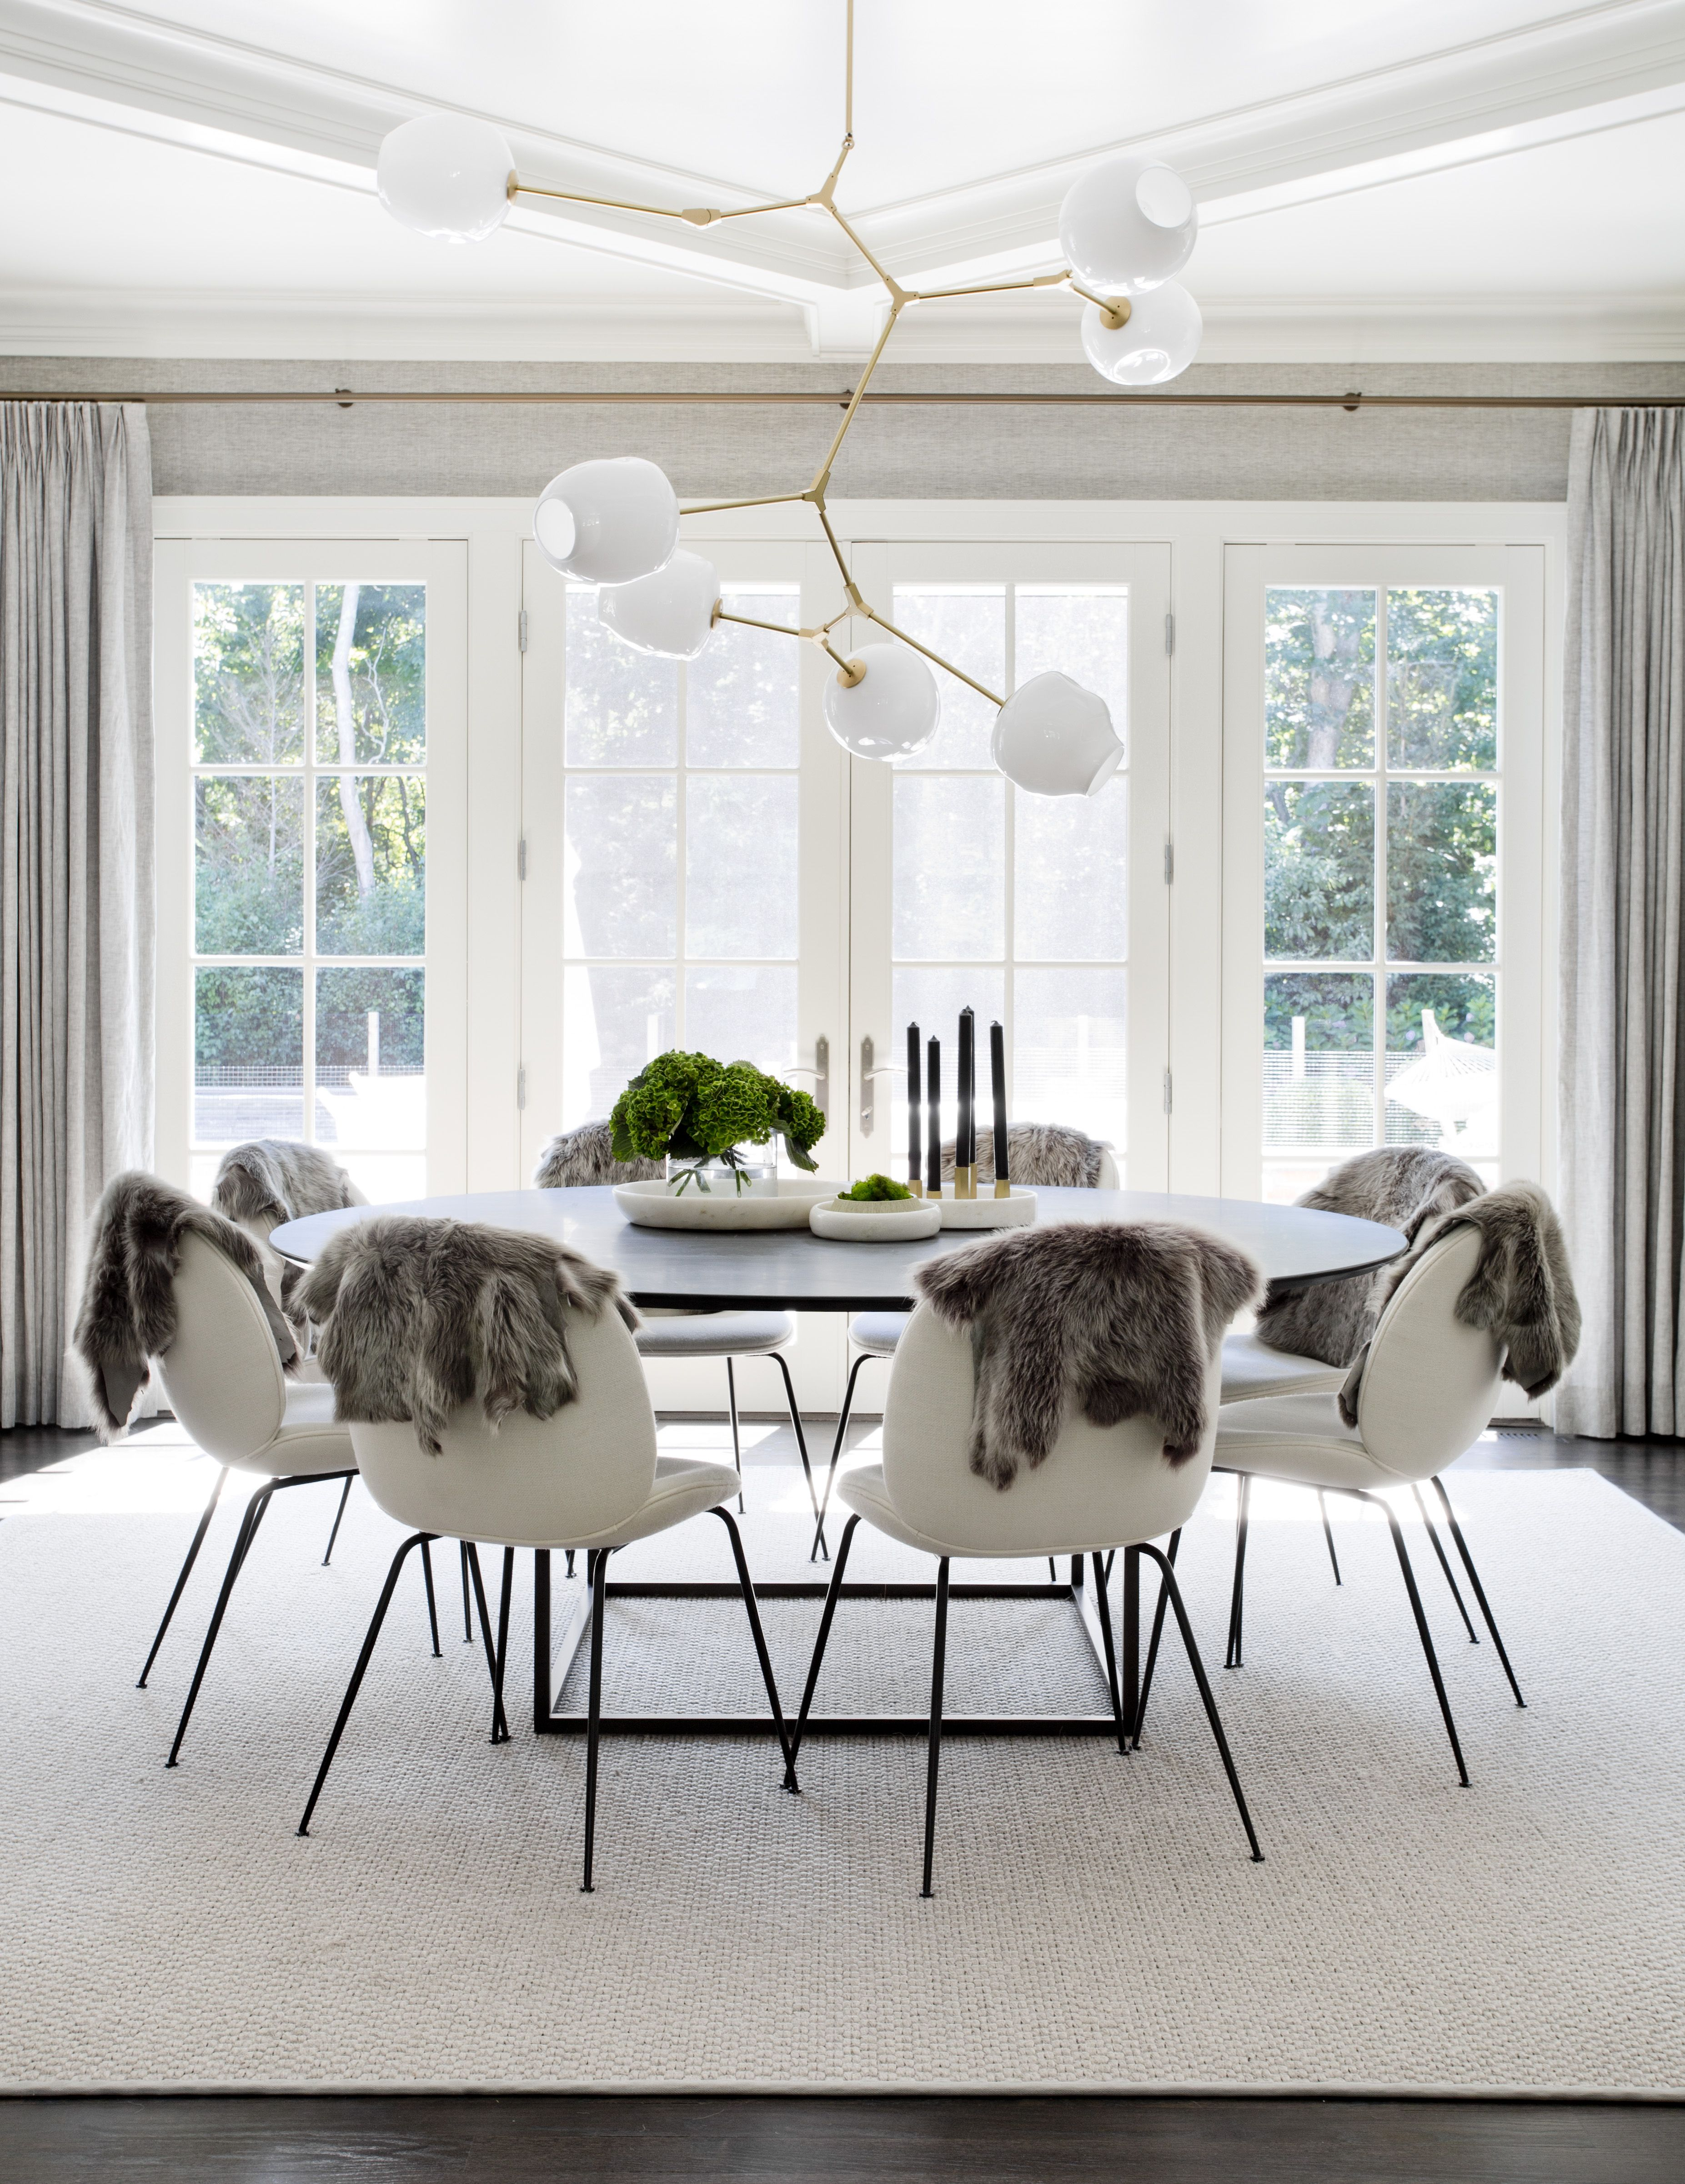 Tamara Magel Interiors/ Sag Harbor Lindsey Adelman Light Remove The Fur  Throw Over The Chairs.